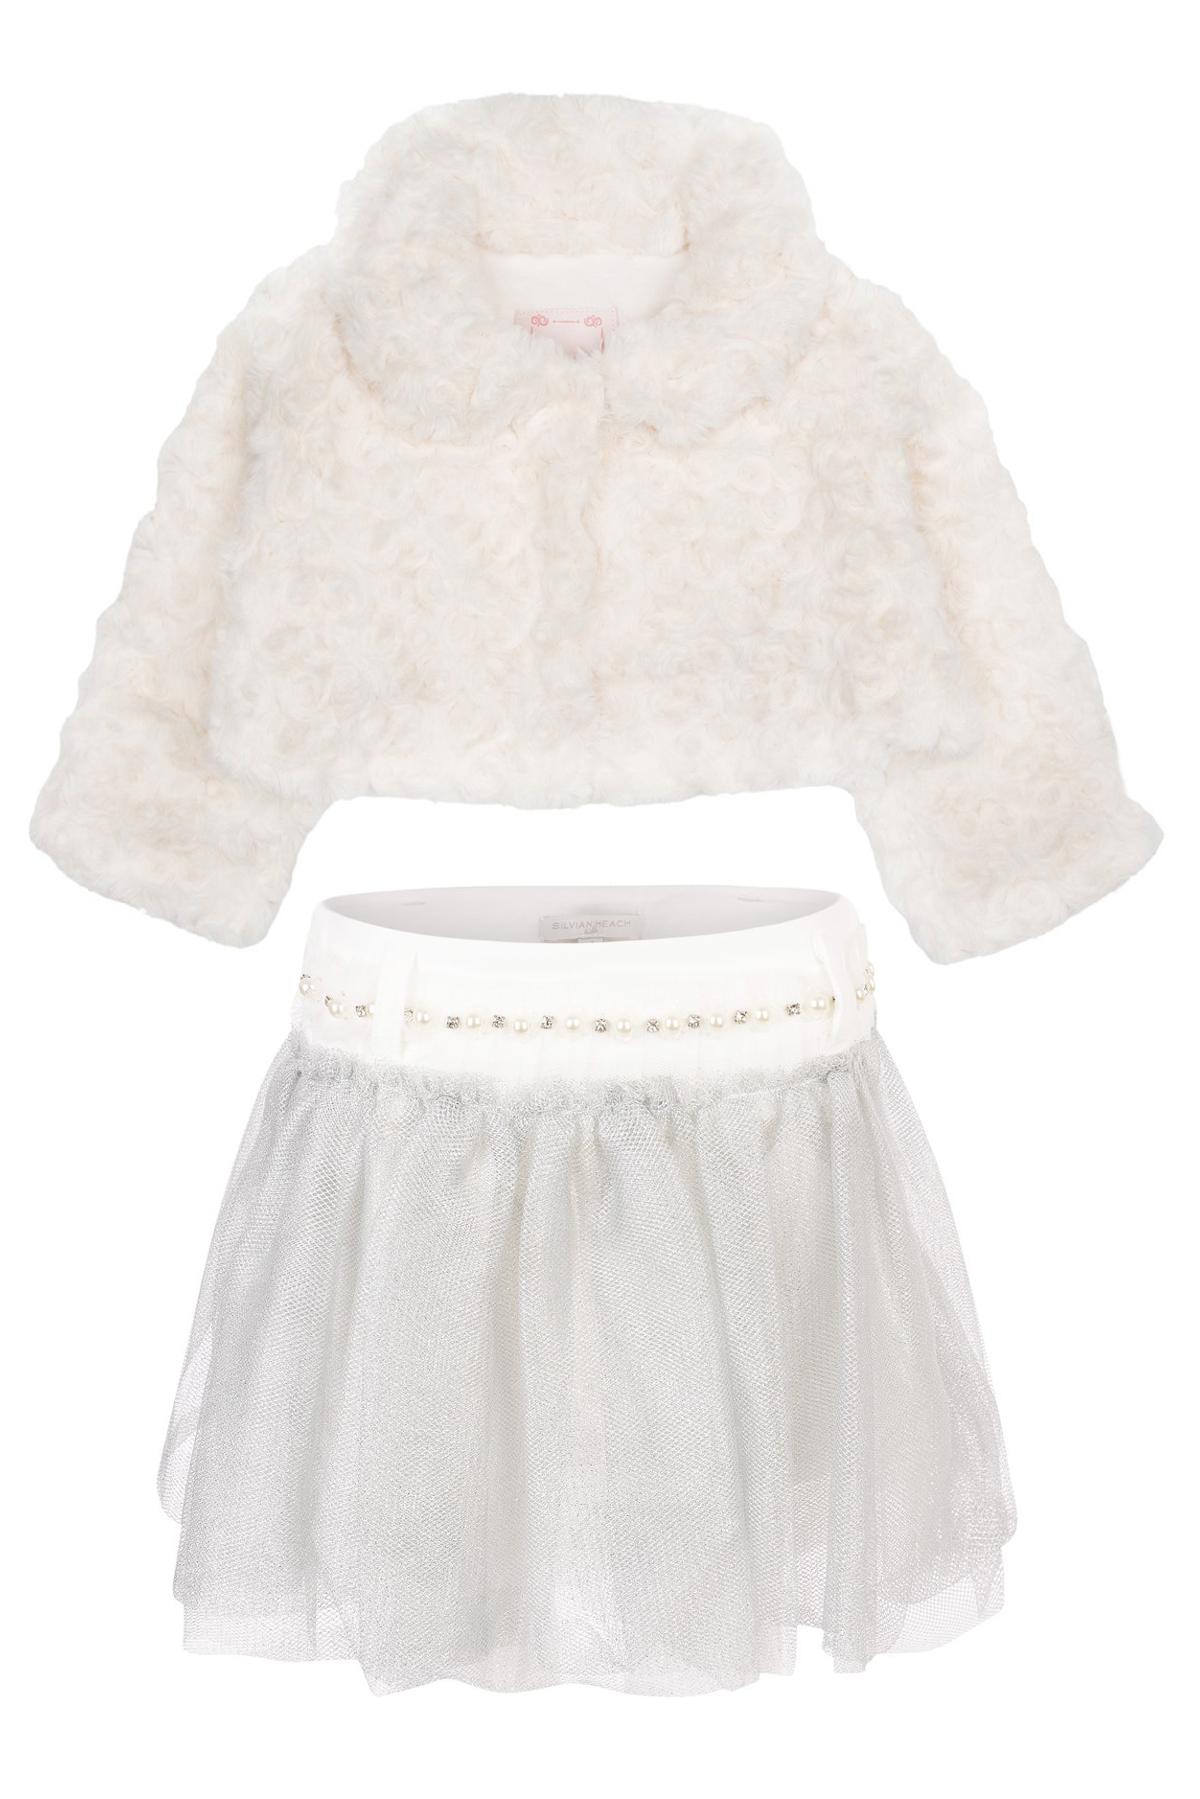 Silvian Heach Kids winter 2014 white fur and grey tulle skirt